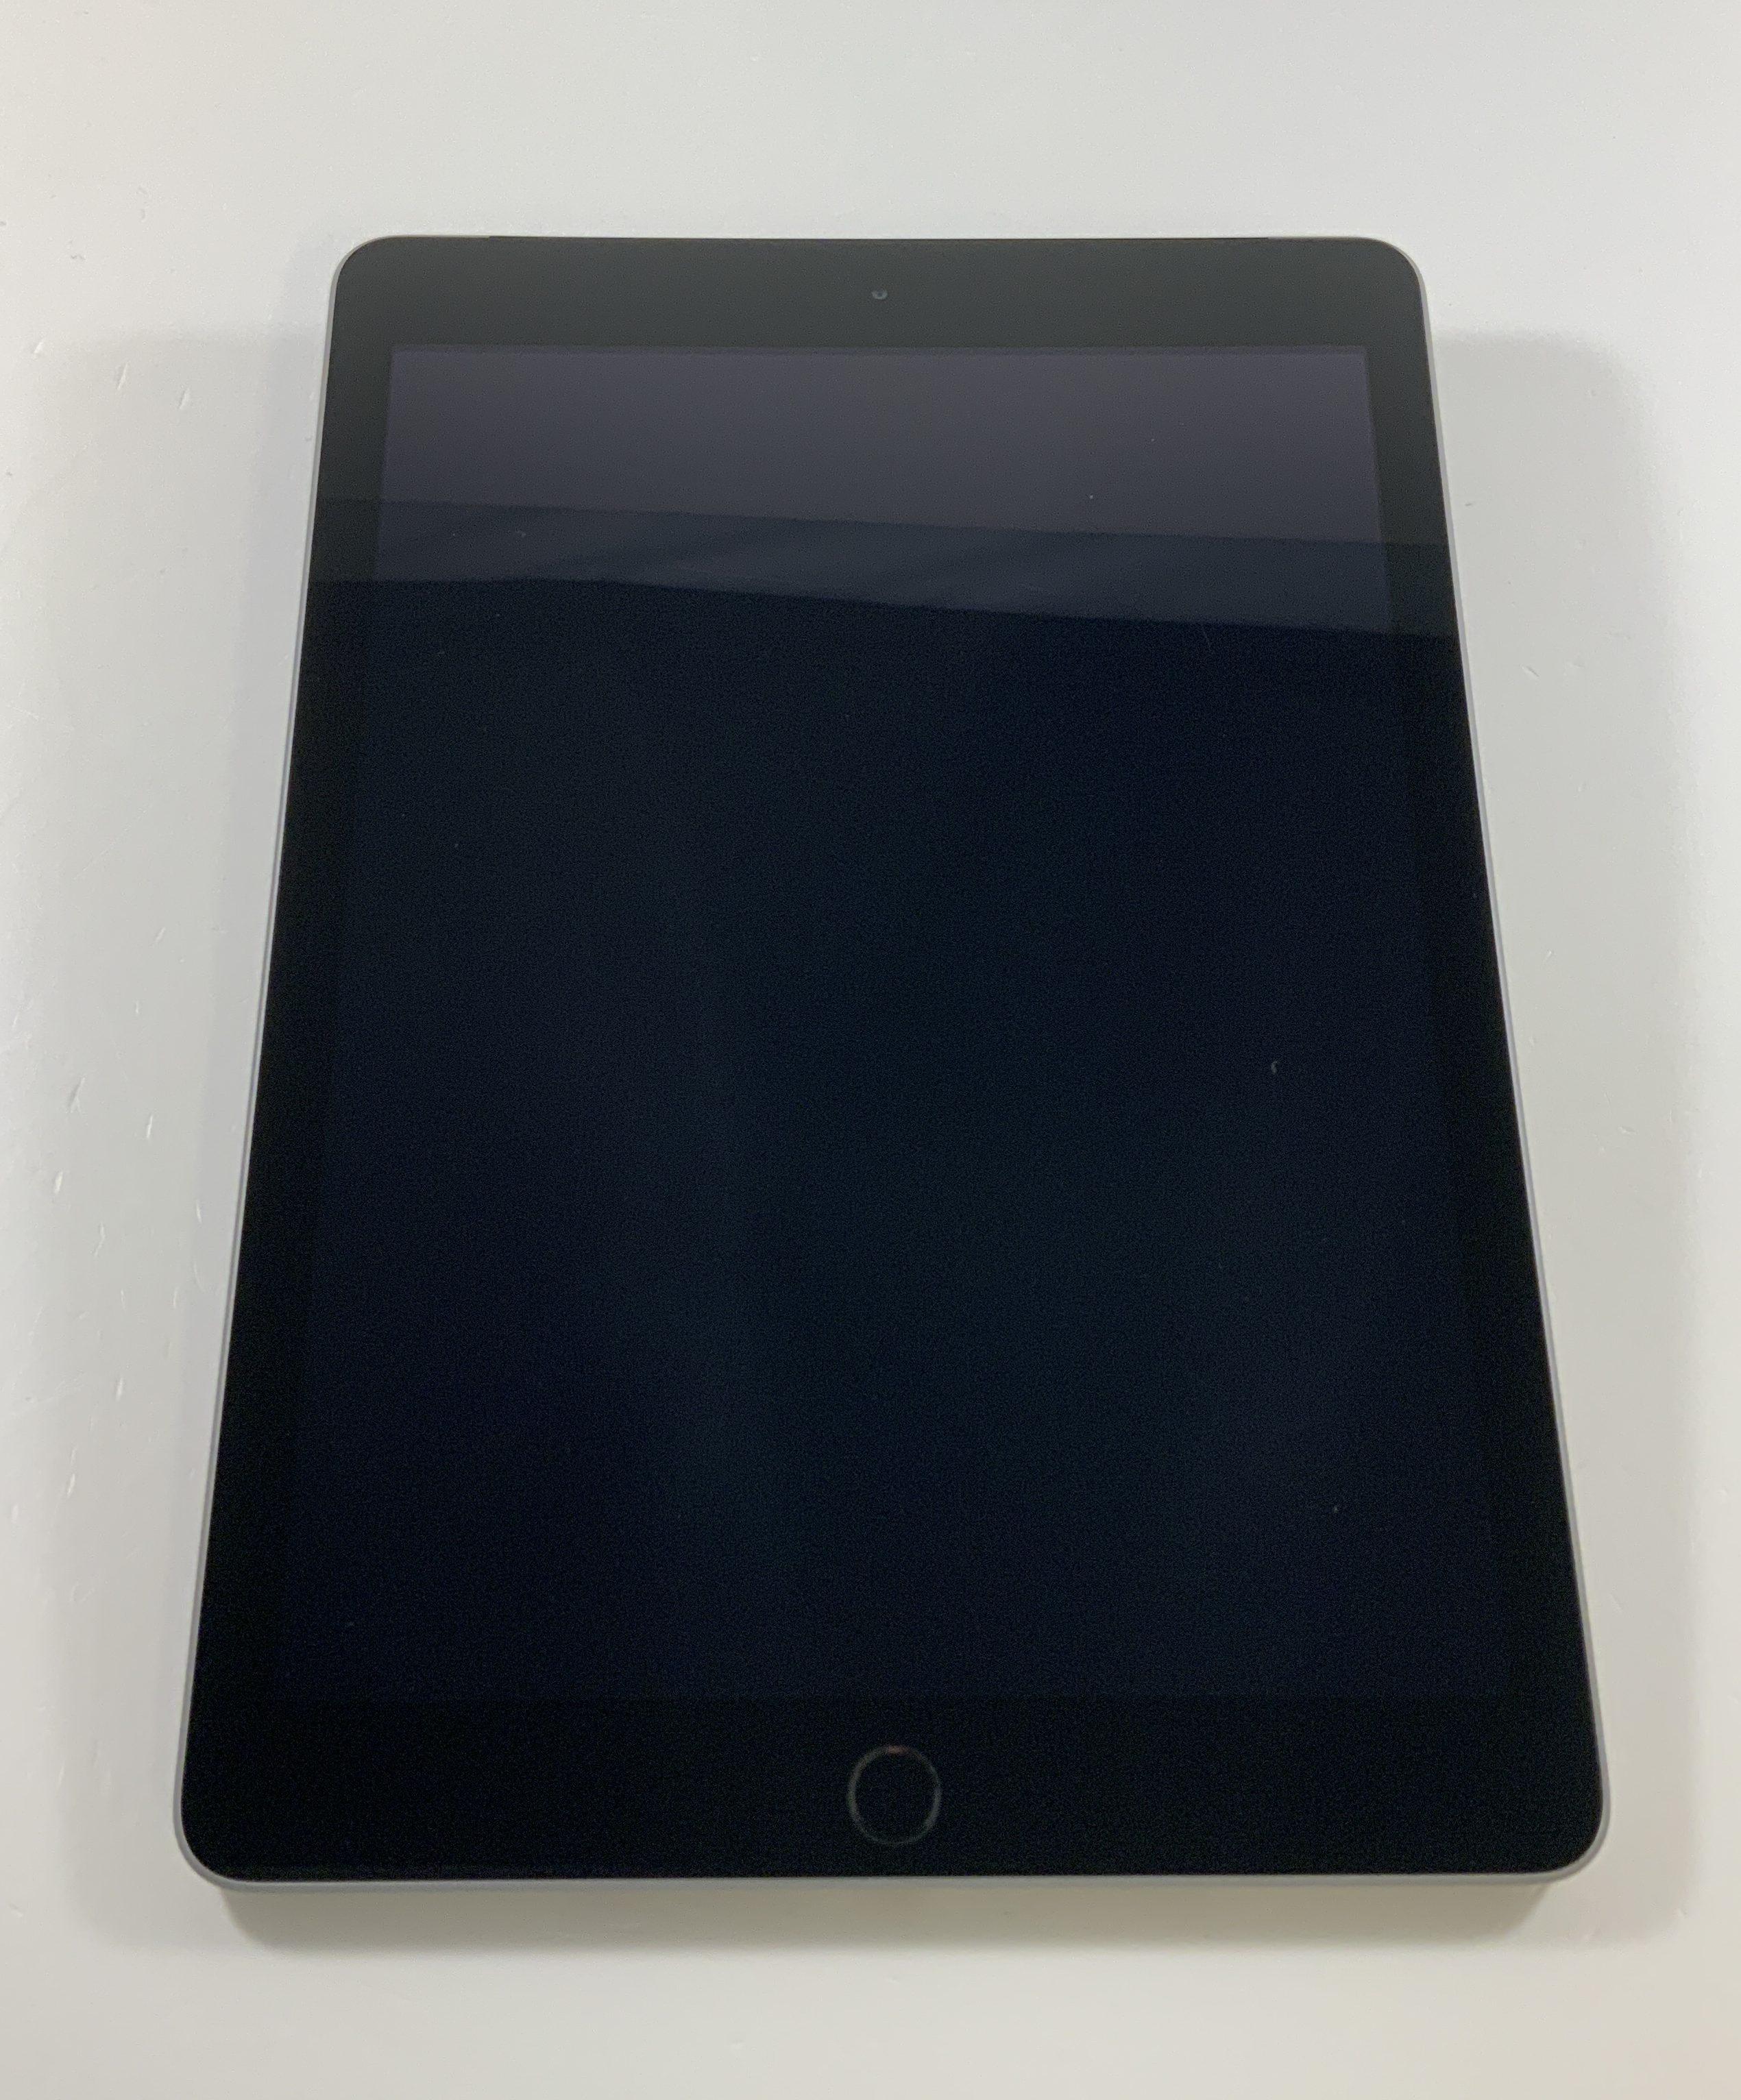 iPad 5 Wi-Fi + Cellular 128GB, 128GB, Space Gray, immagine 1